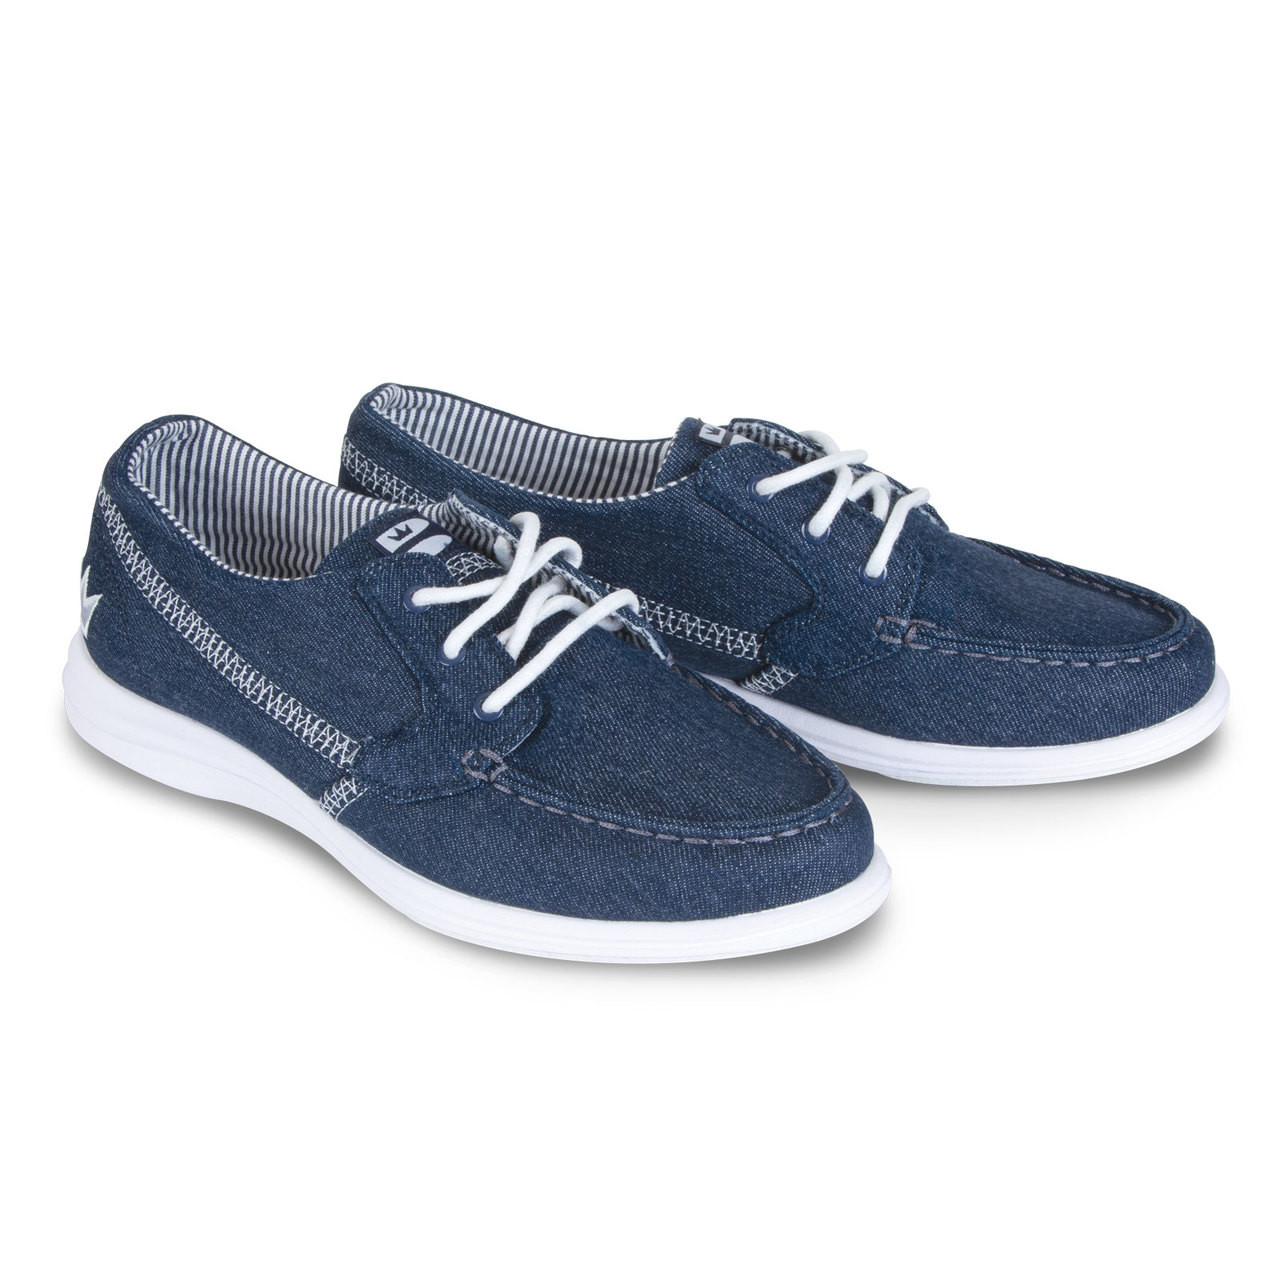 0e4caae78c6 Brunswick Karma Womens Bowling Shoes Denim FREE SHIPPING ...